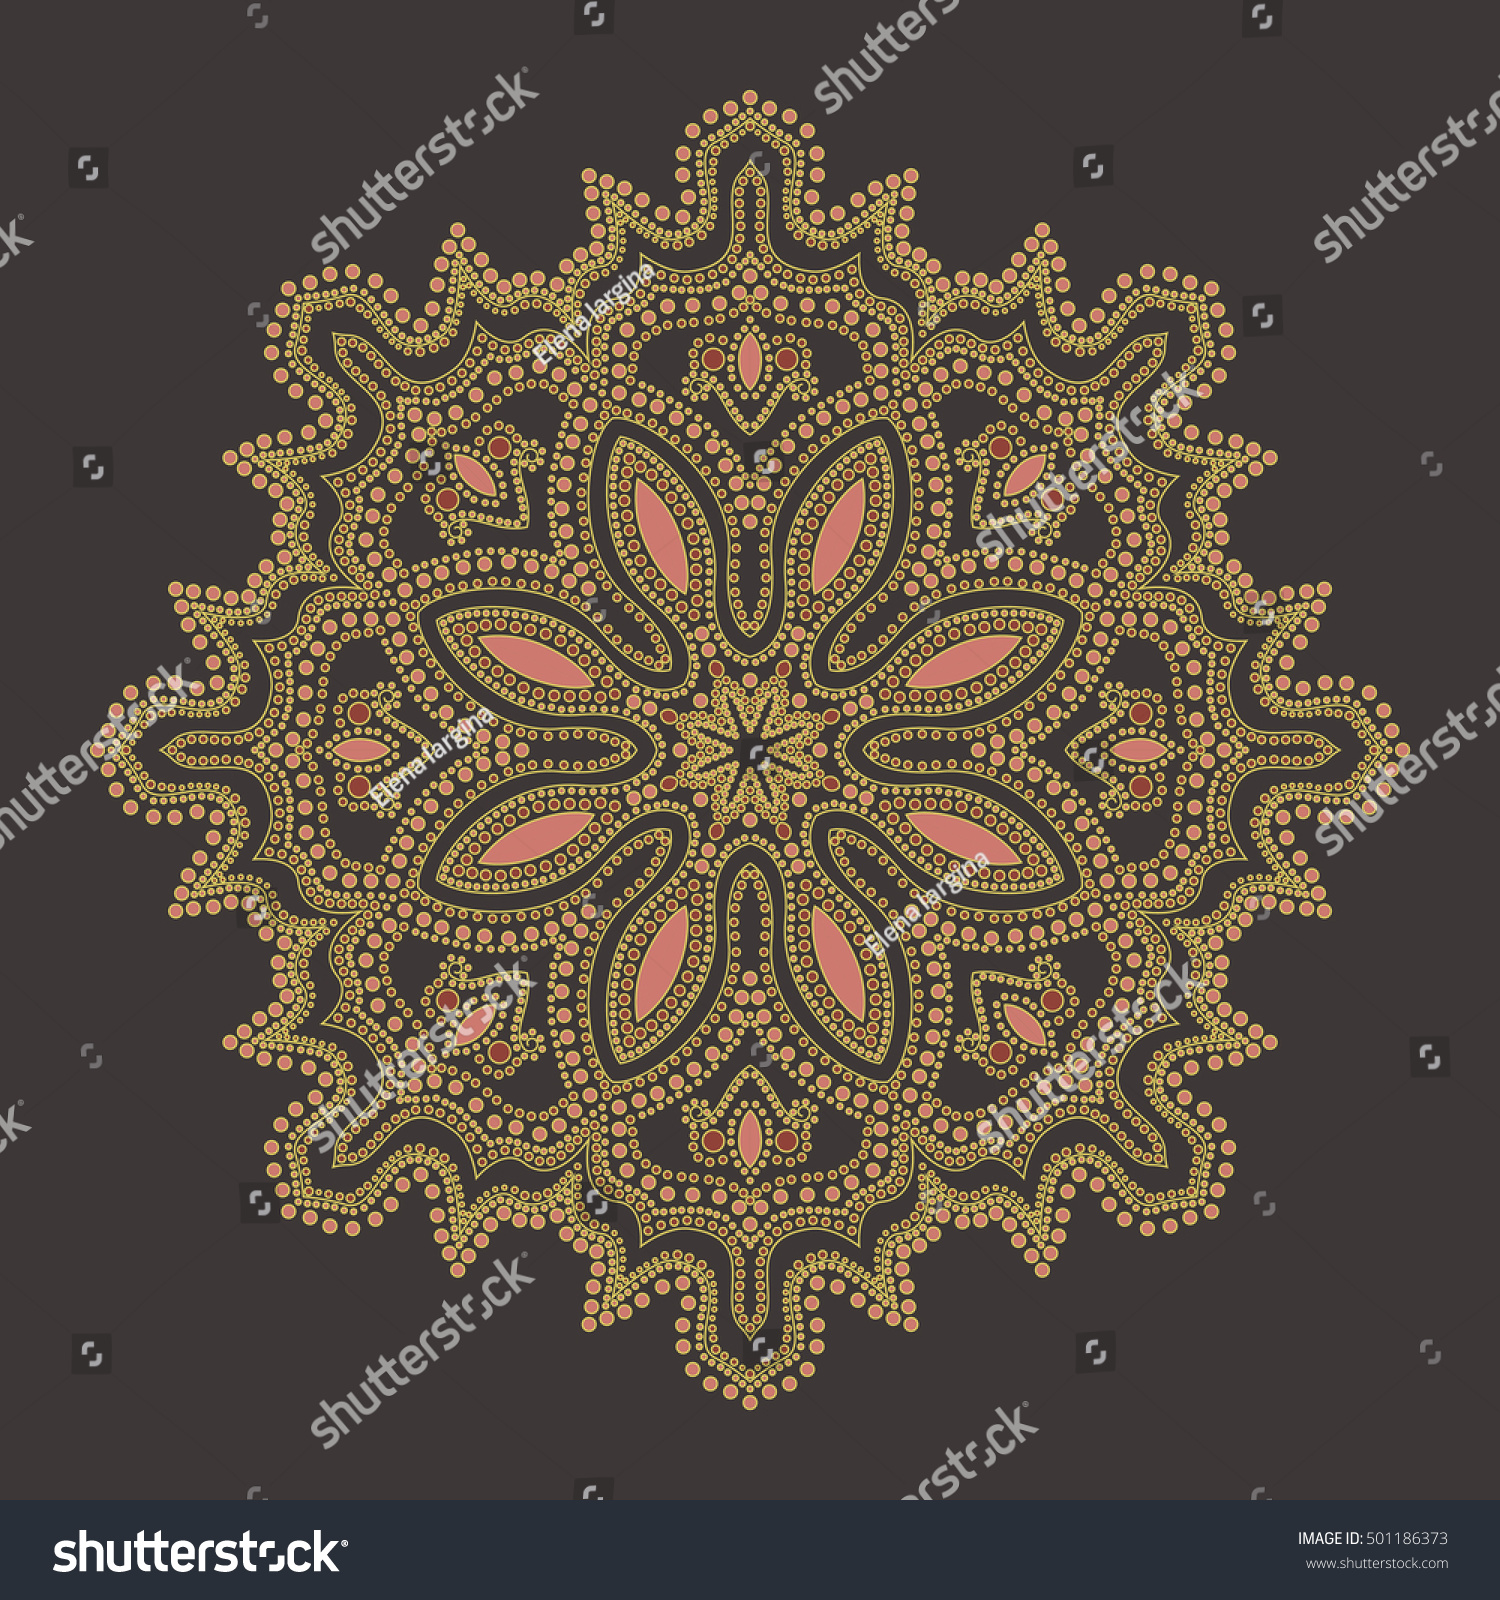 decorative element oriental motif ornament vintage stock vector 501186373 shutterstock. Black Bedroom Furniture Sets. Home Design Ideas